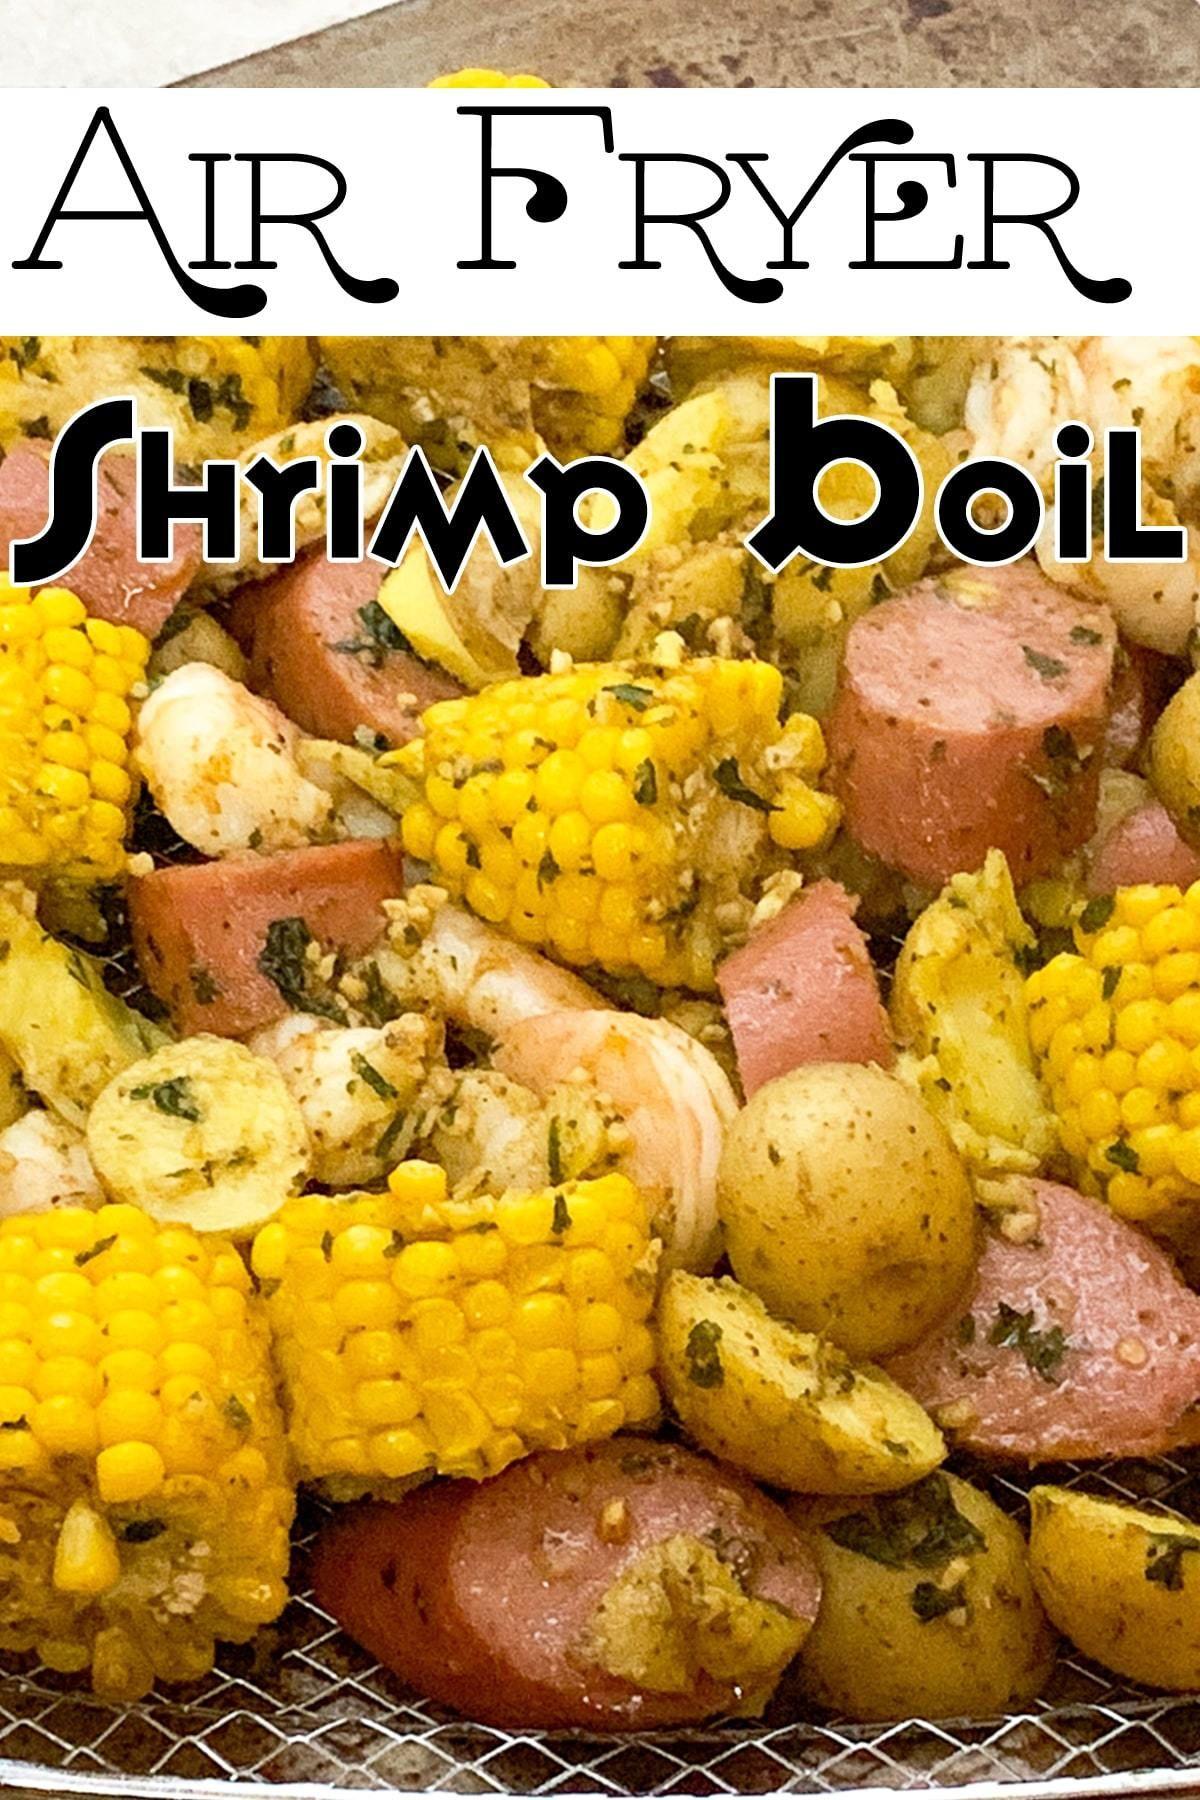 Air Fryer Shrimp Boil | Recipe